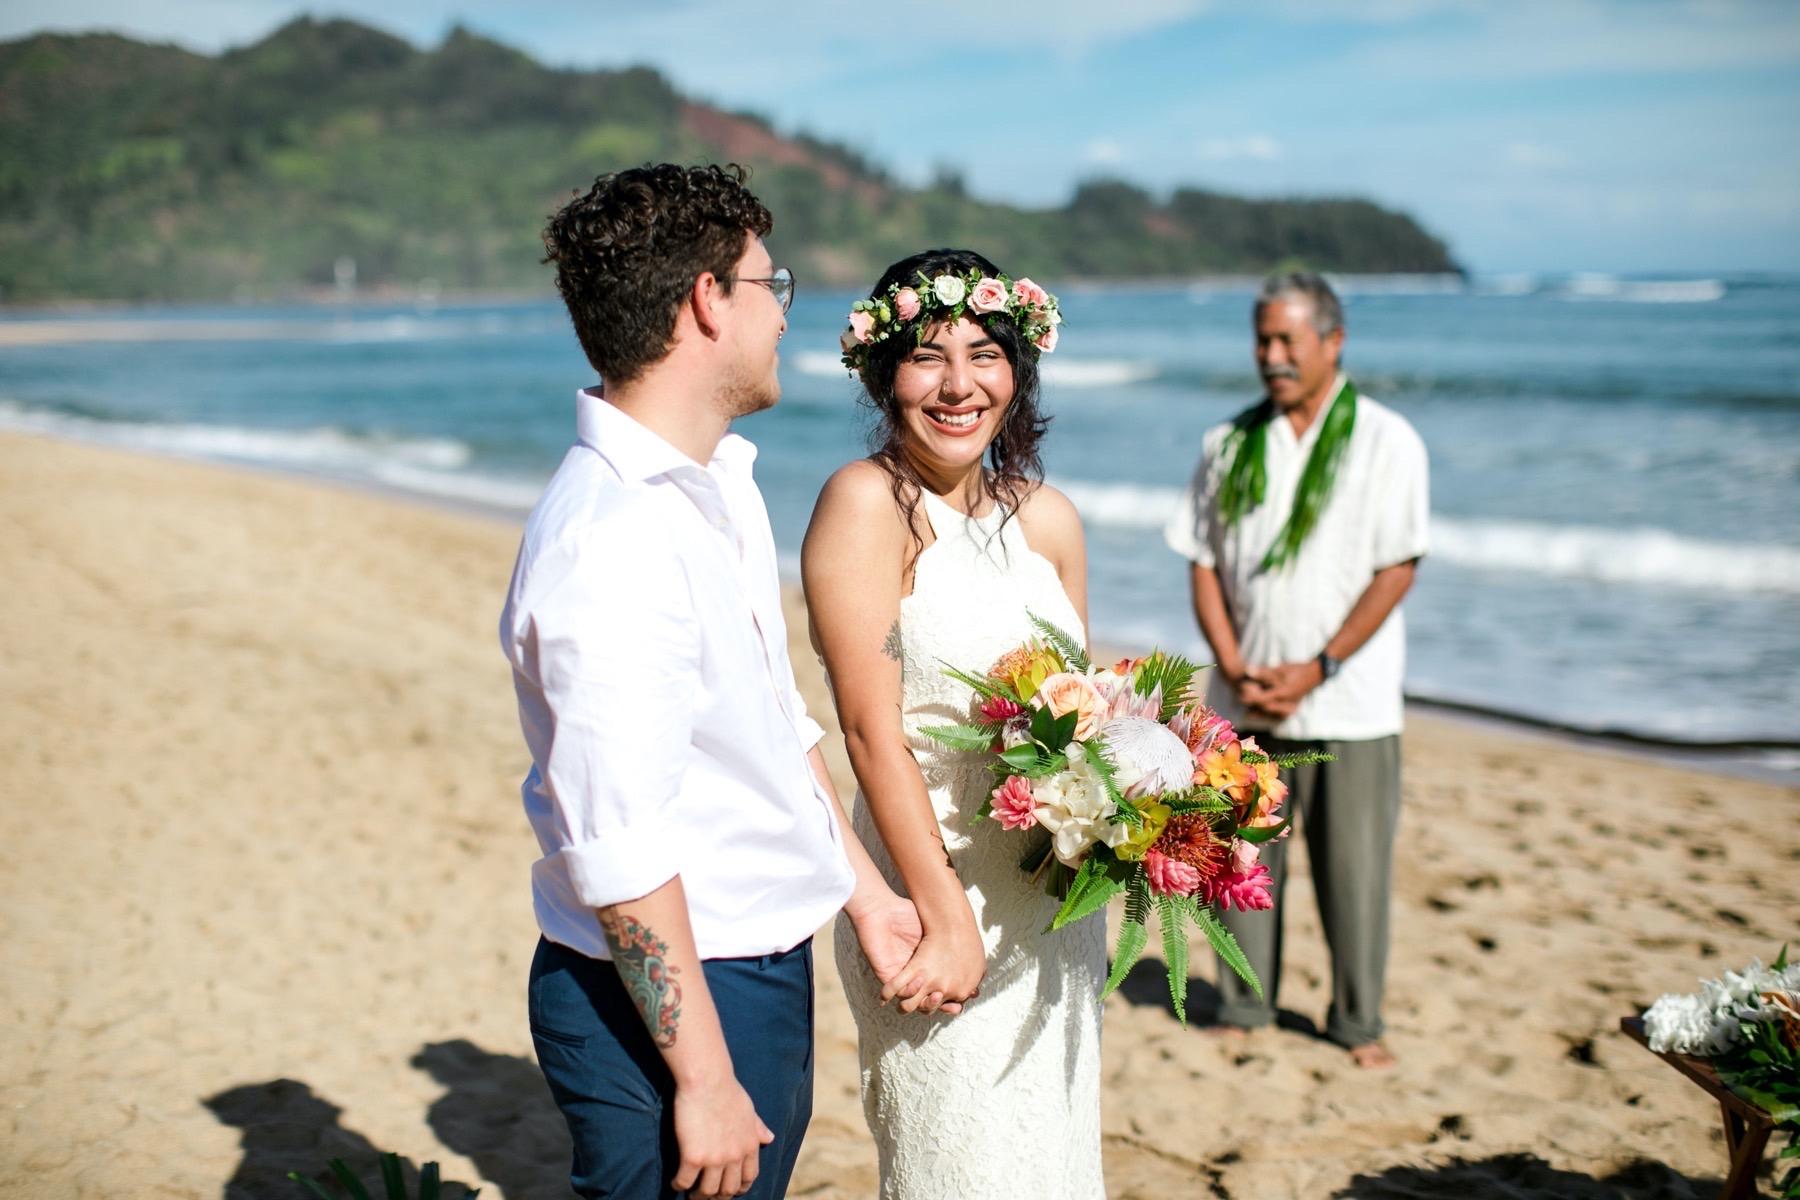 Maya & Gilberto on the beach for their wedding.